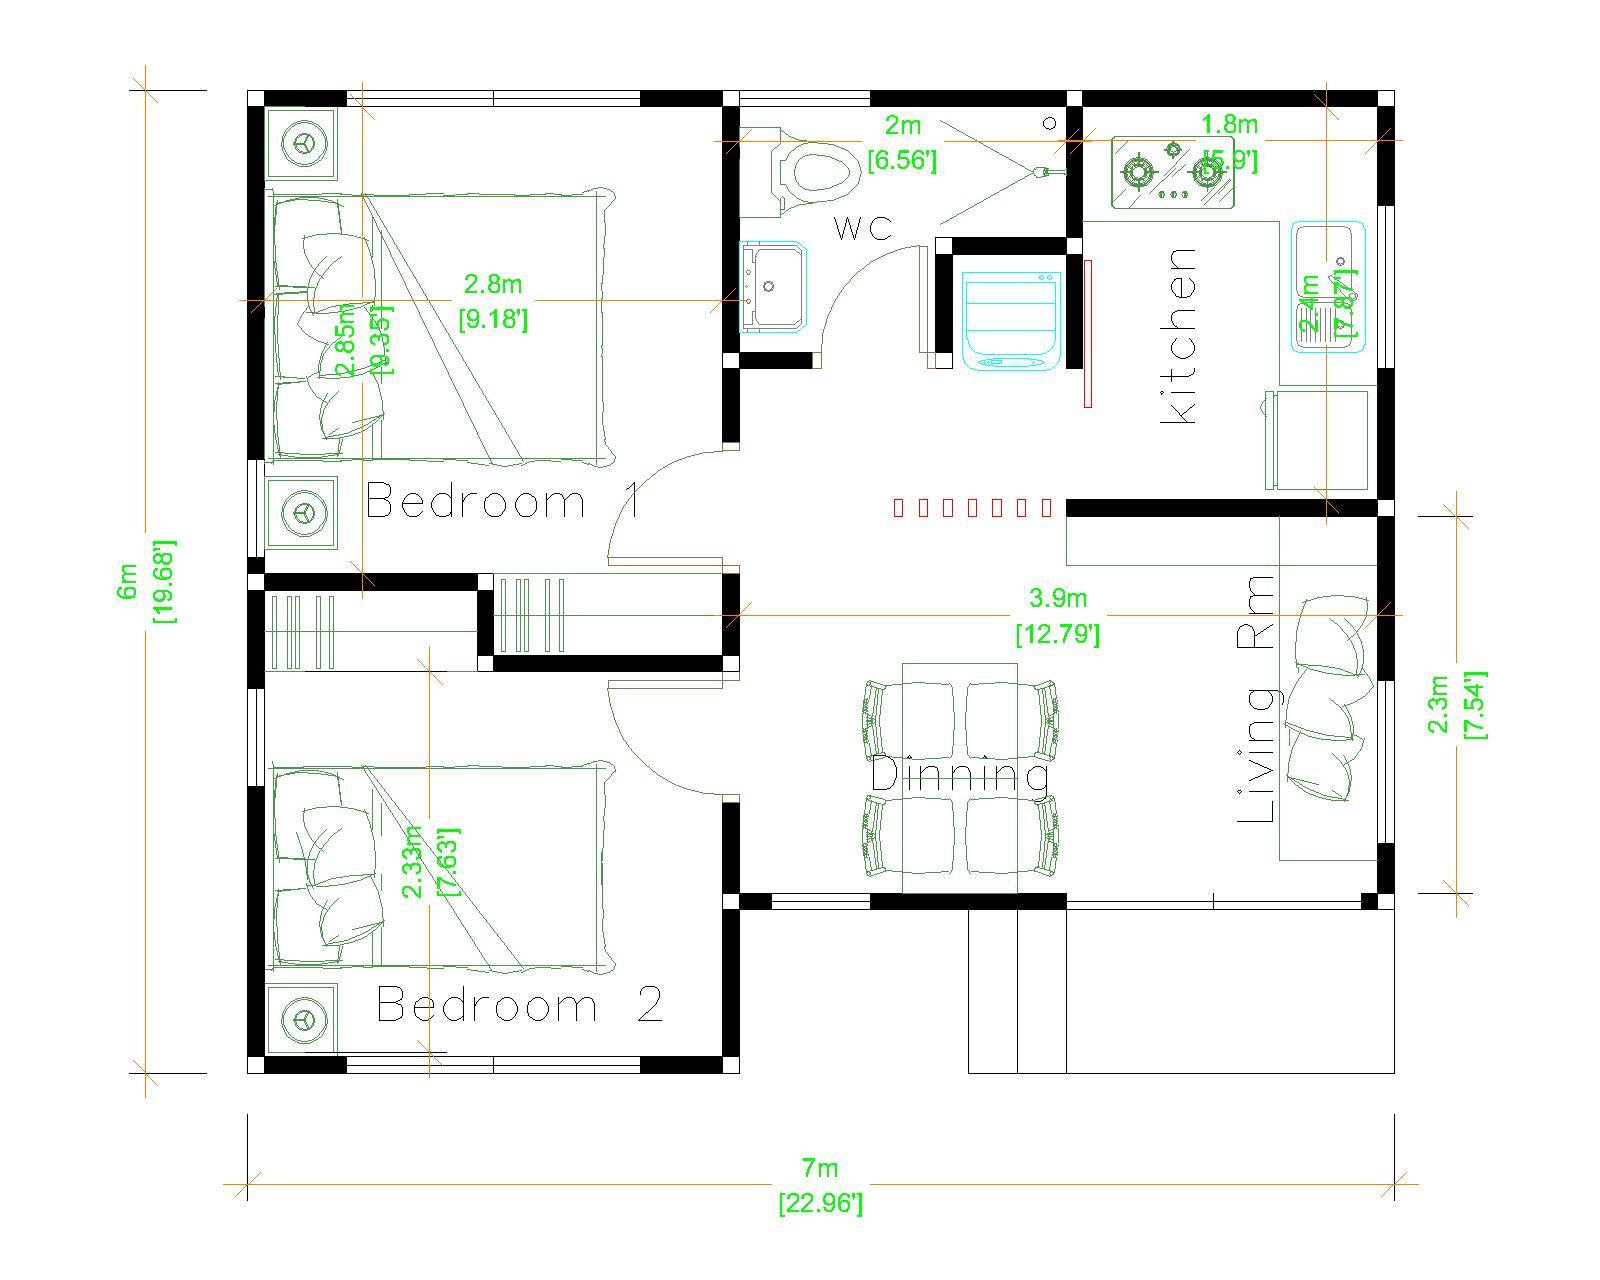 Tiny Home Living 7x6 Meter 23x20 Feet Layout plan